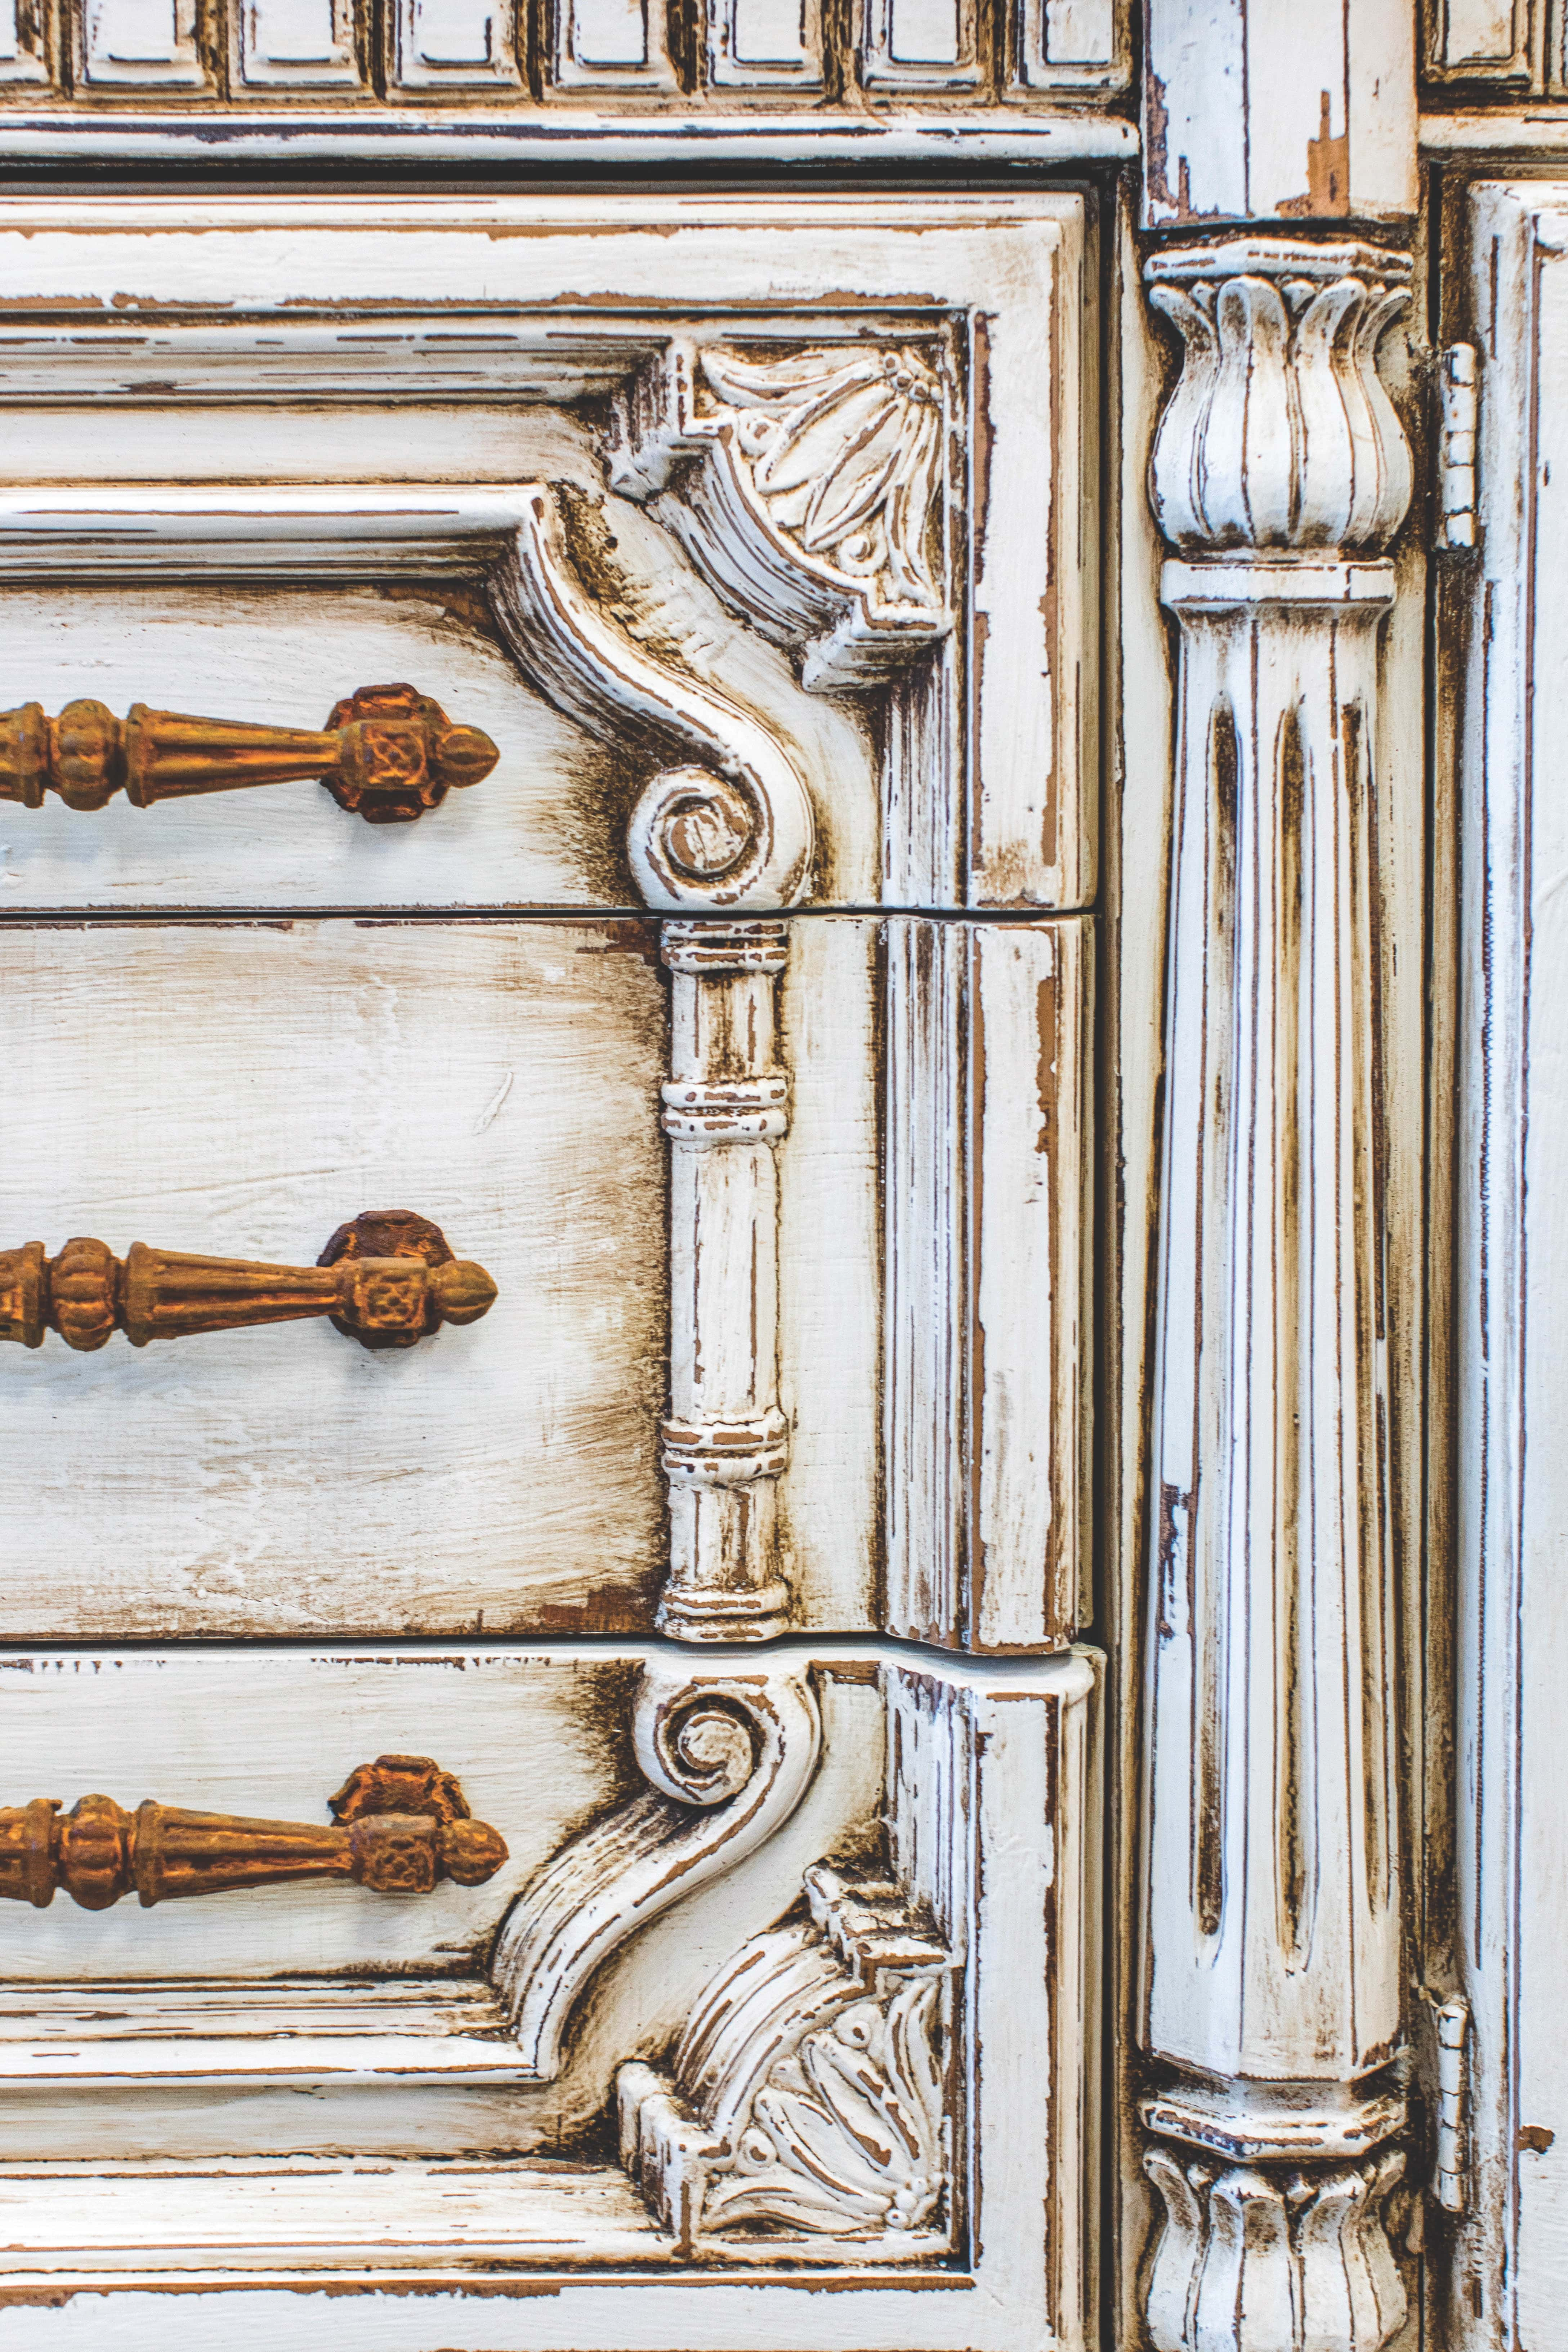 A custom painted dresser by Marisol Gullo